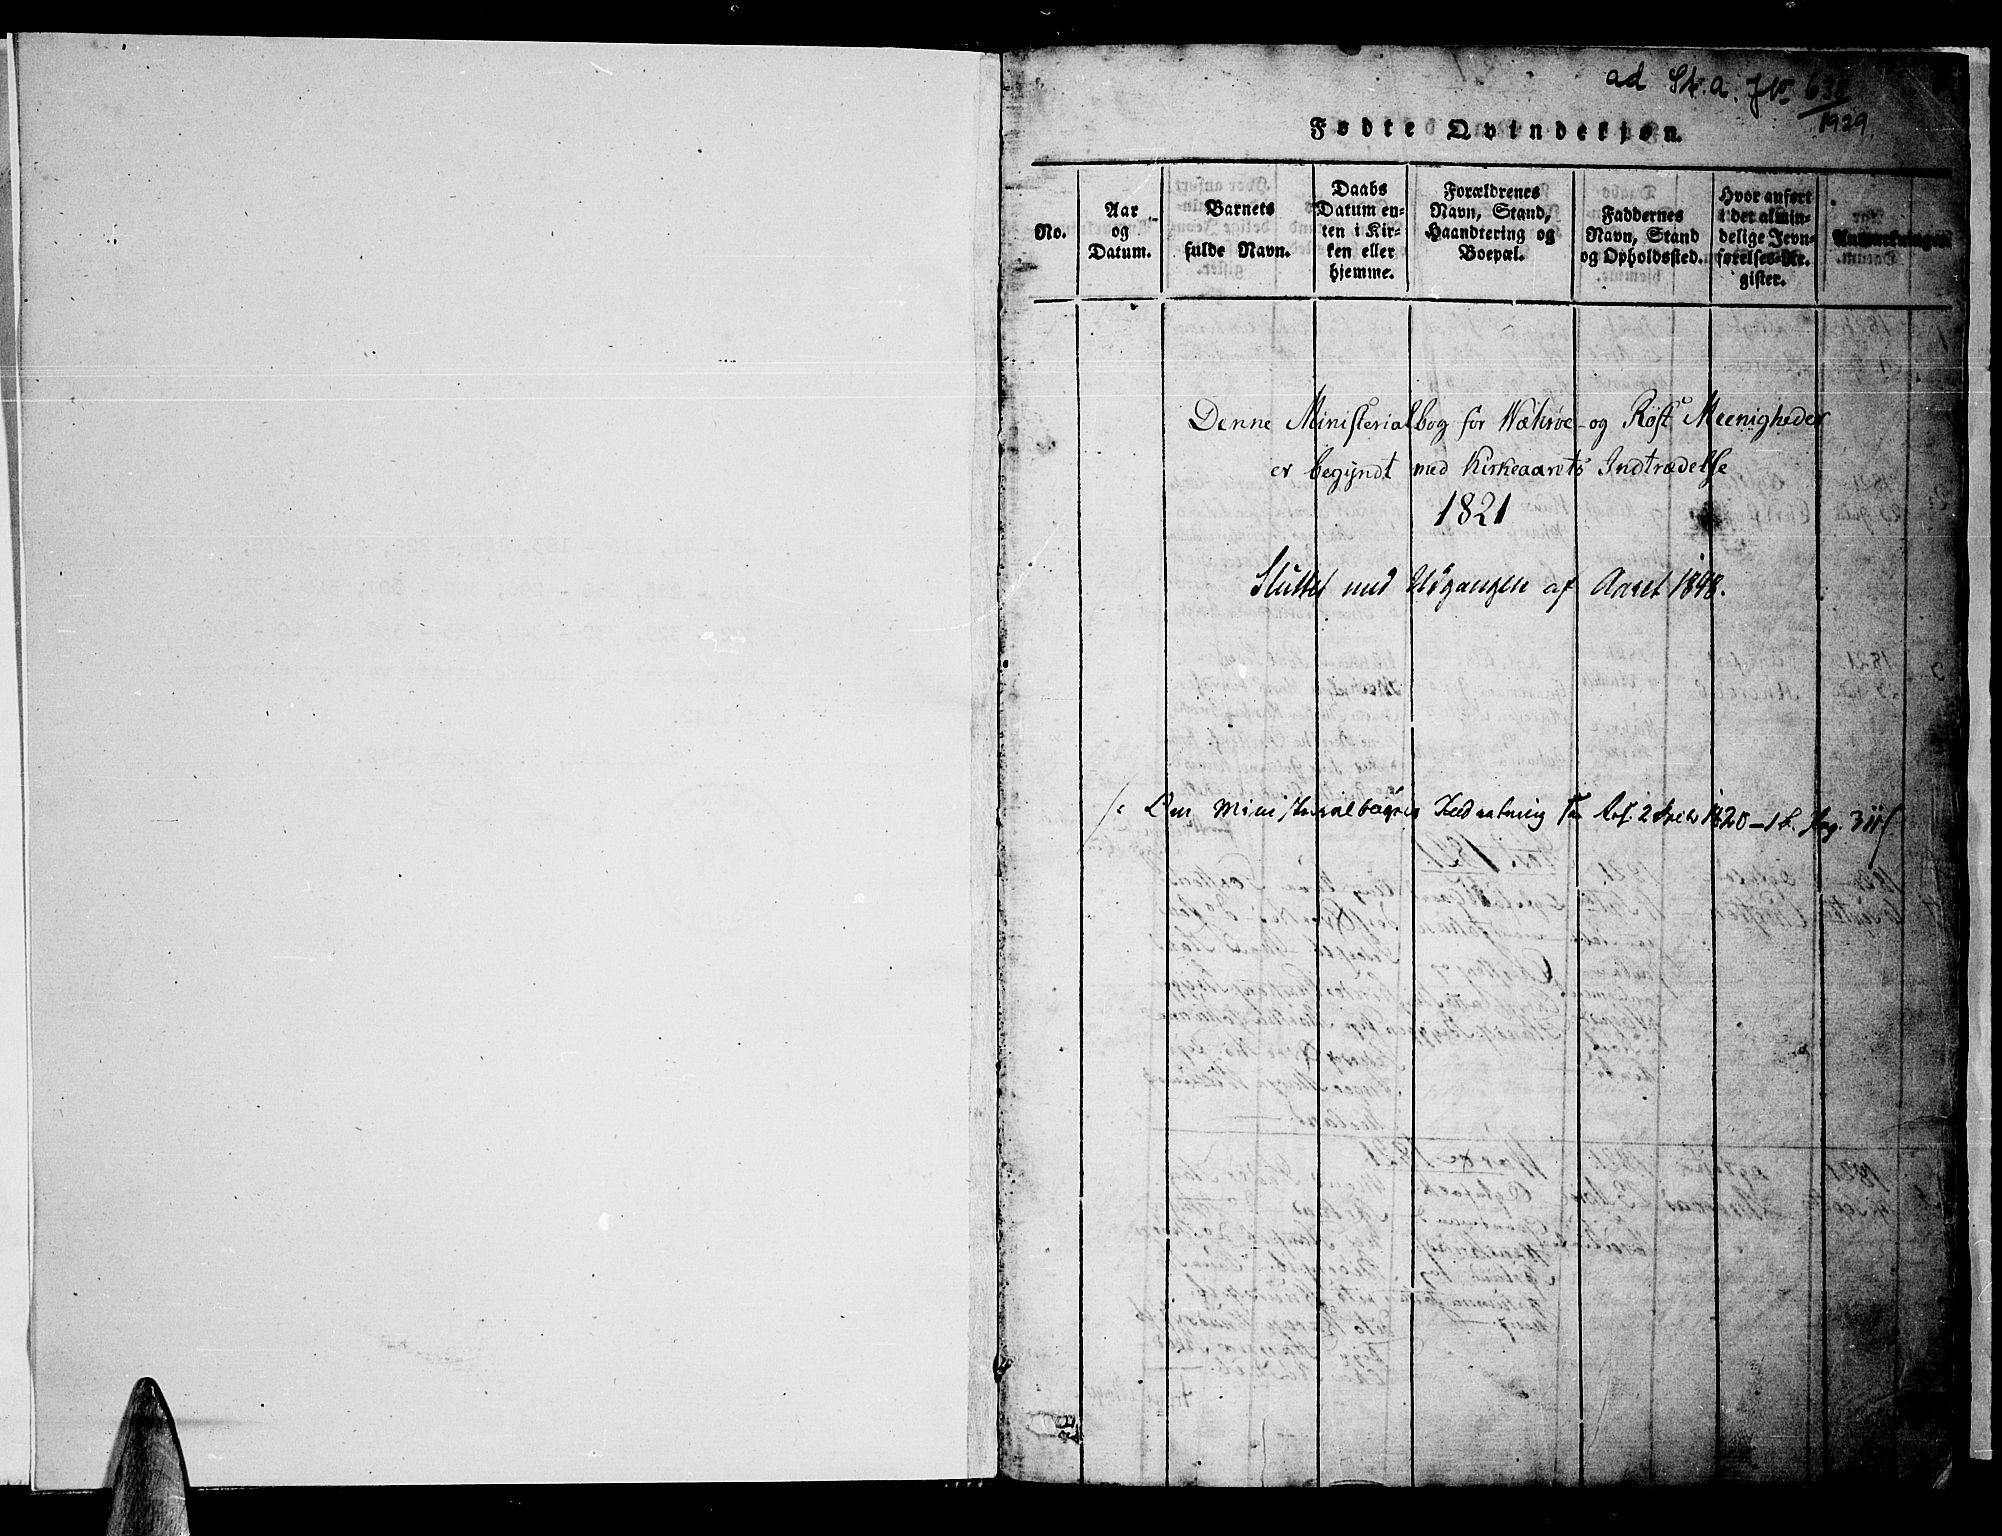 SAT, Ministerialprotokoller, klokkerbøker og fødselsregistre - Nordland, 807/L0120: Ministerialbok nr. 807A03, 1821-1848, s. 1